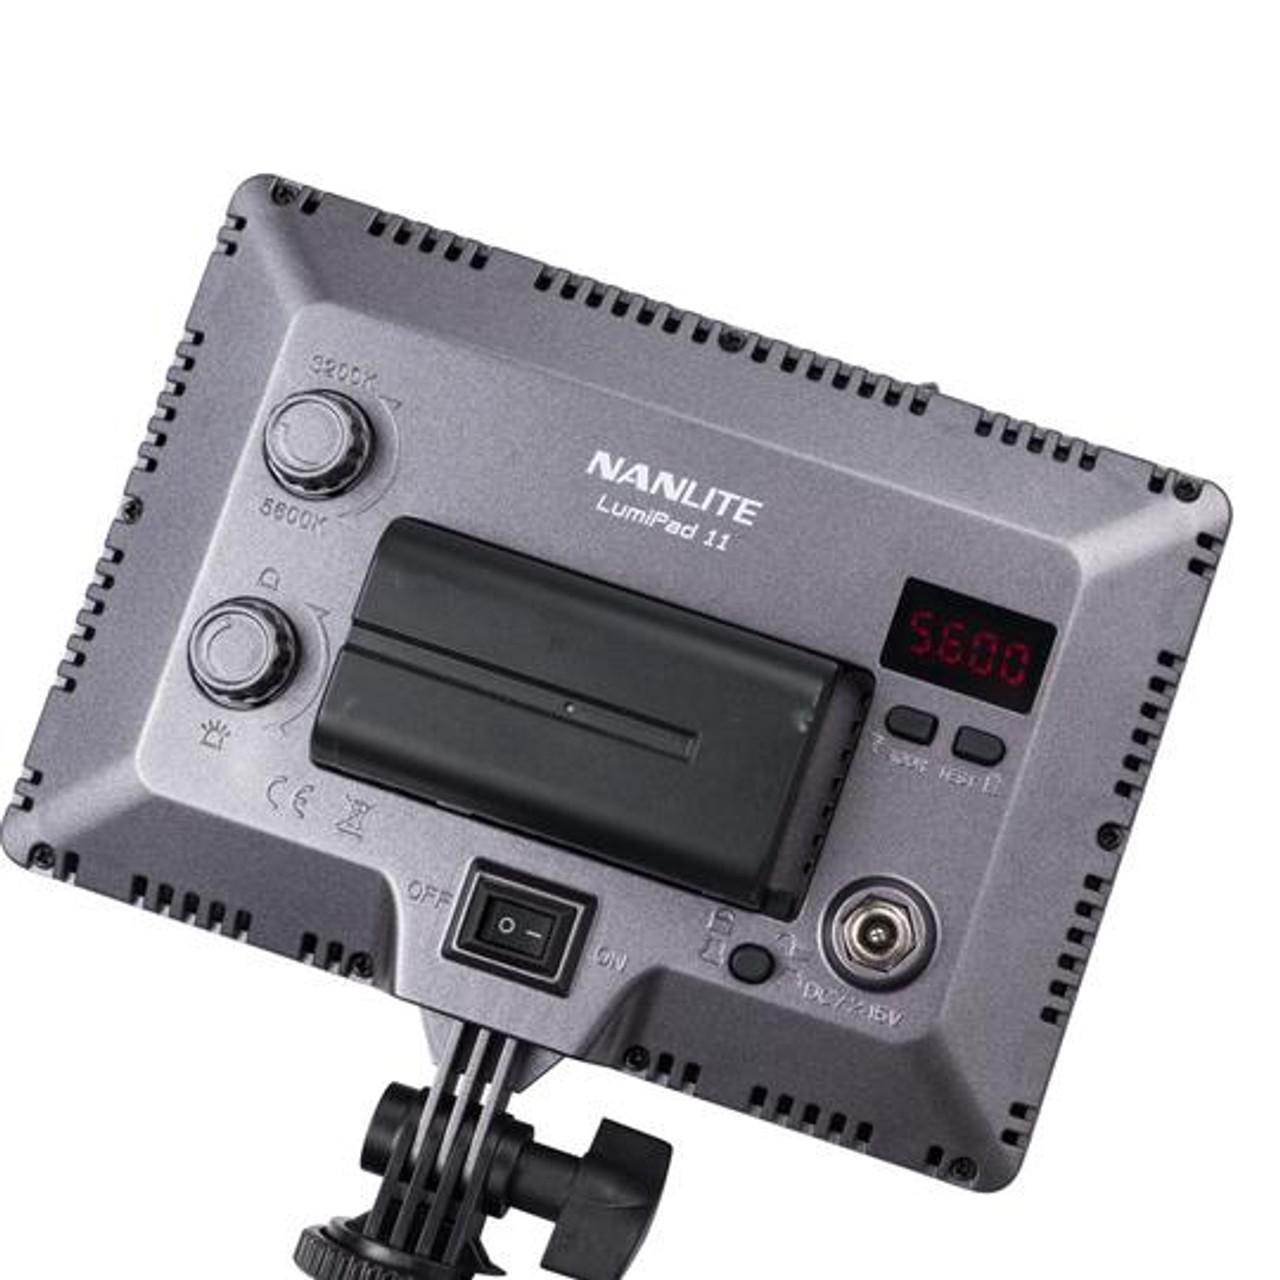 "NANLITE LUMIPAD 11 BICOLOR LED PANEL (7"")"